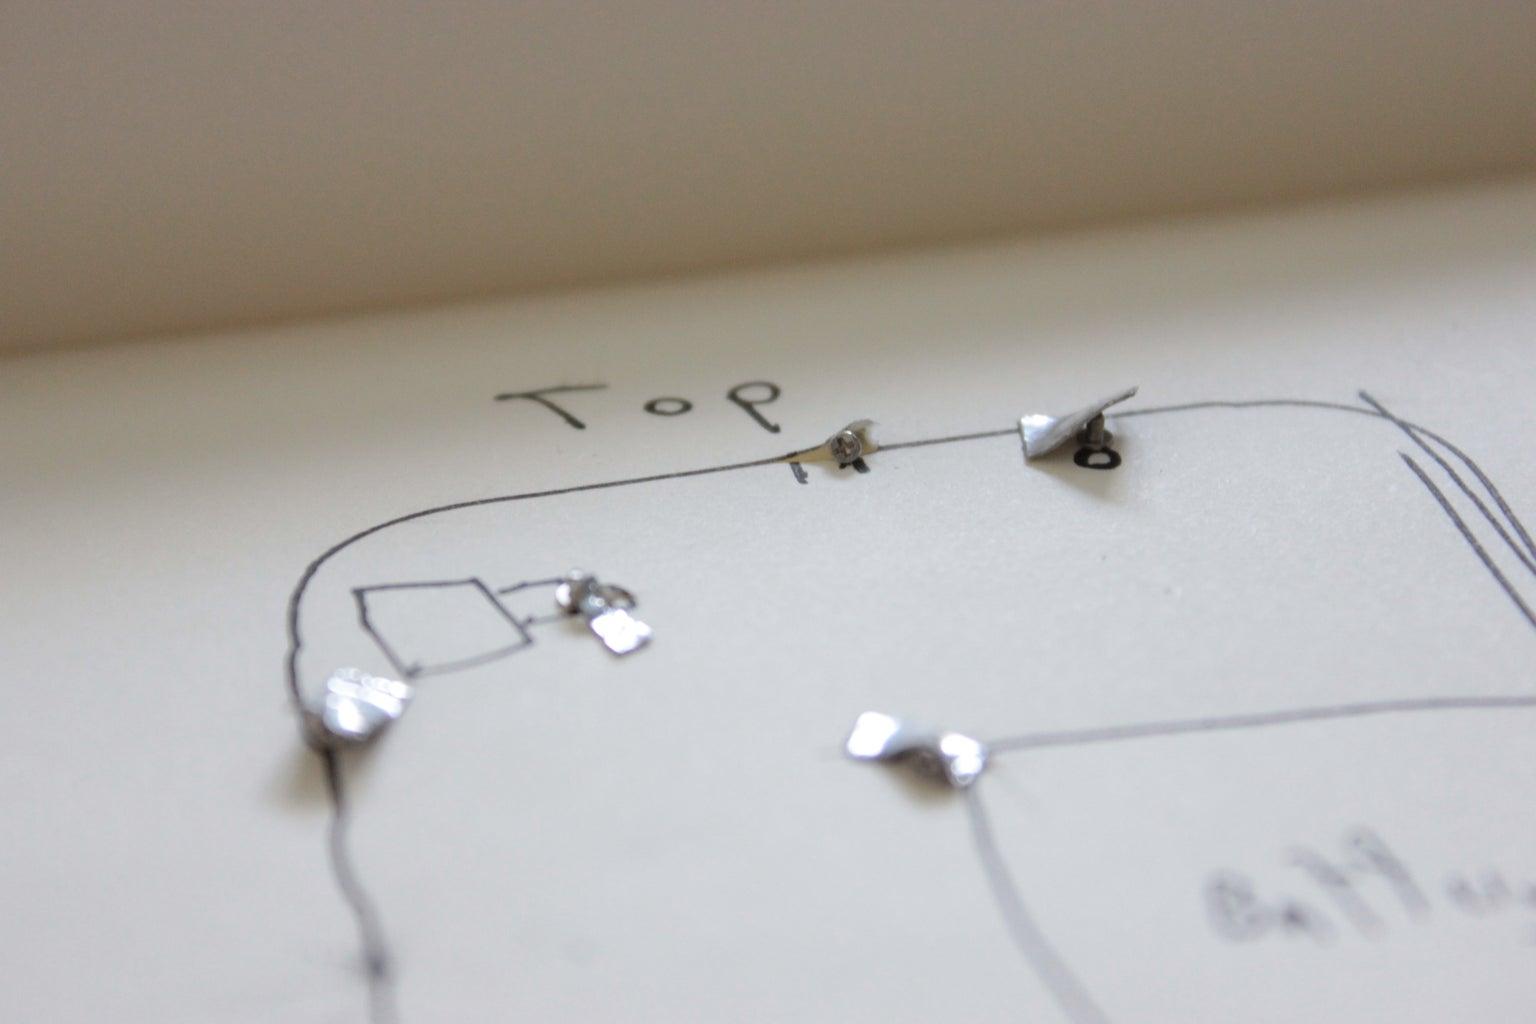 Preparing Your Notebook